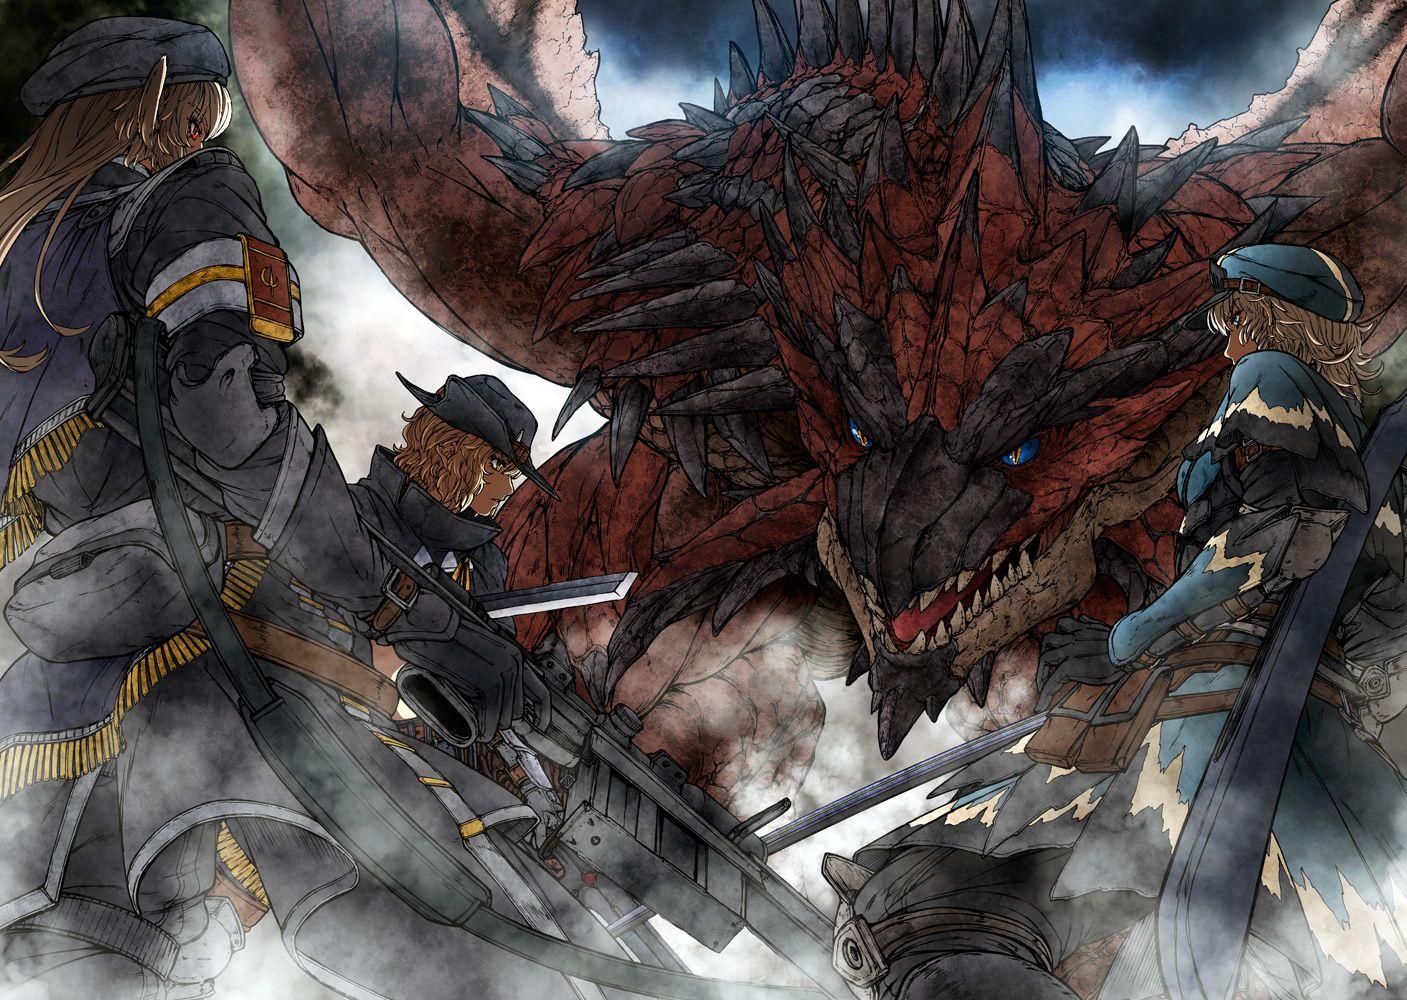 Another Monster Hunter Crossover Monster Hunter Monster Hunter Rathalos Monster Hunter Art